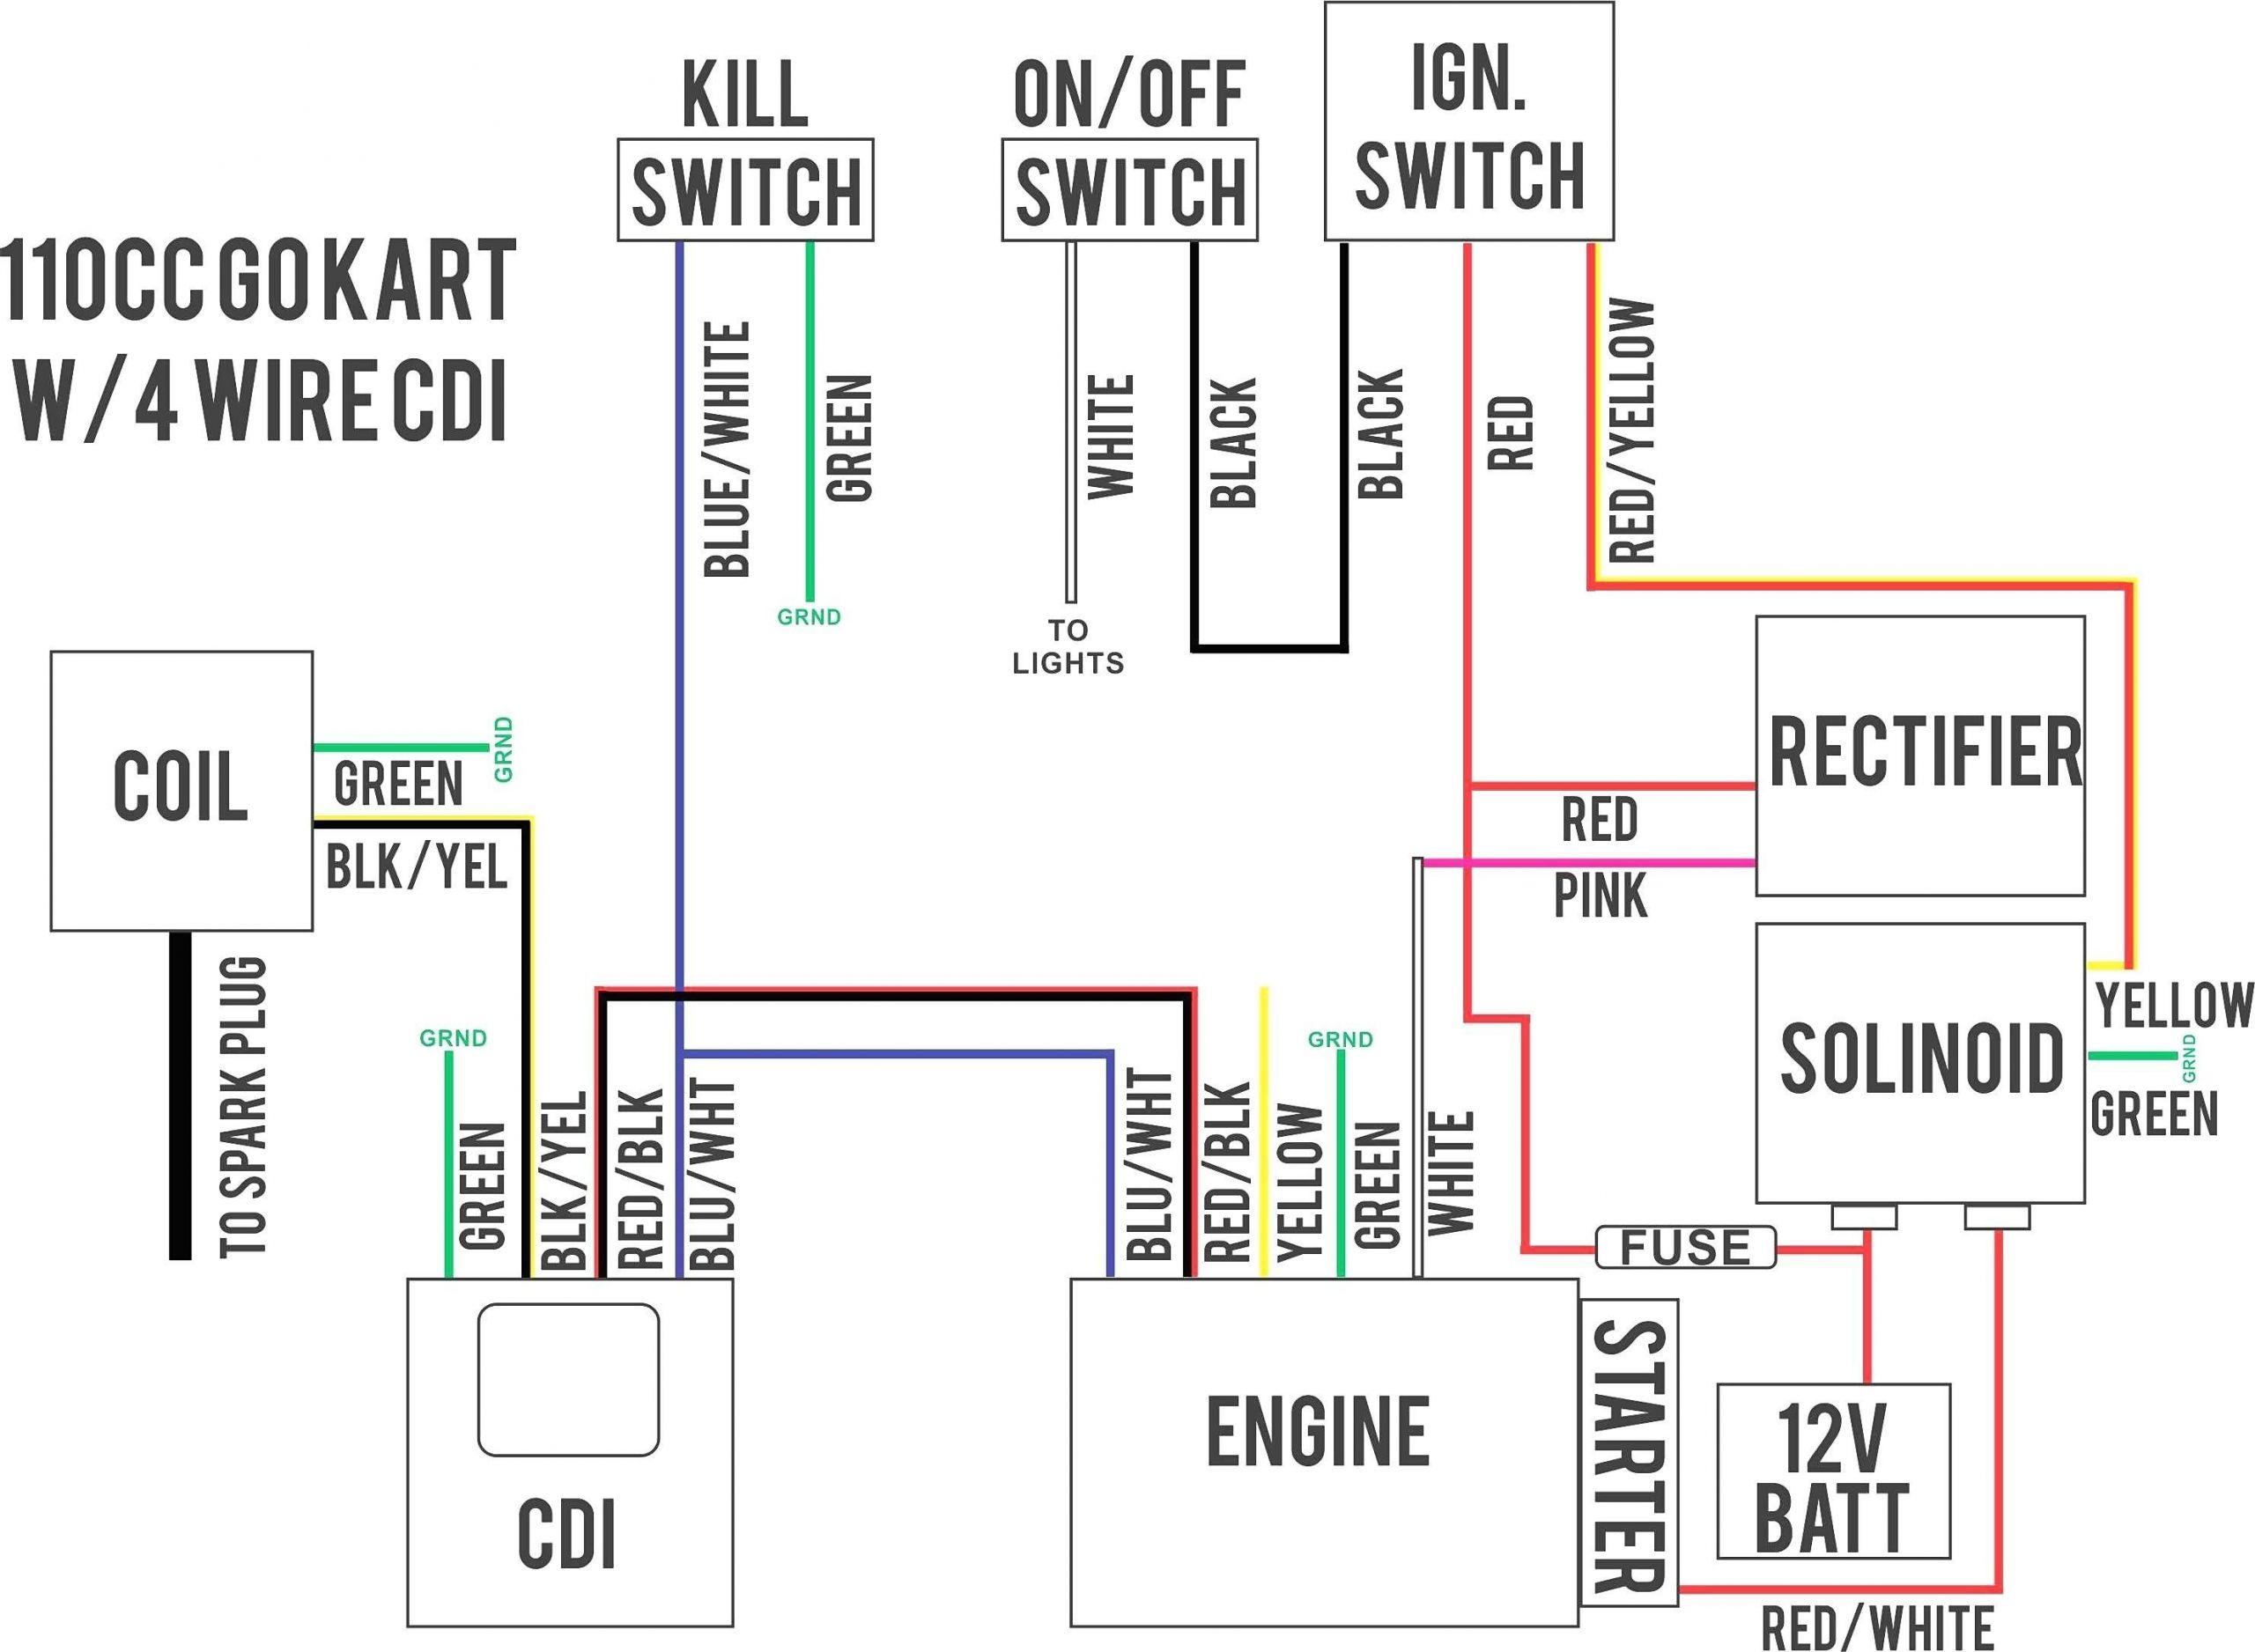 Wright Wszk Wiring Diagram Wright Stander Electric Start Wire Schematic Of Wright Wszk Wiring Diagram